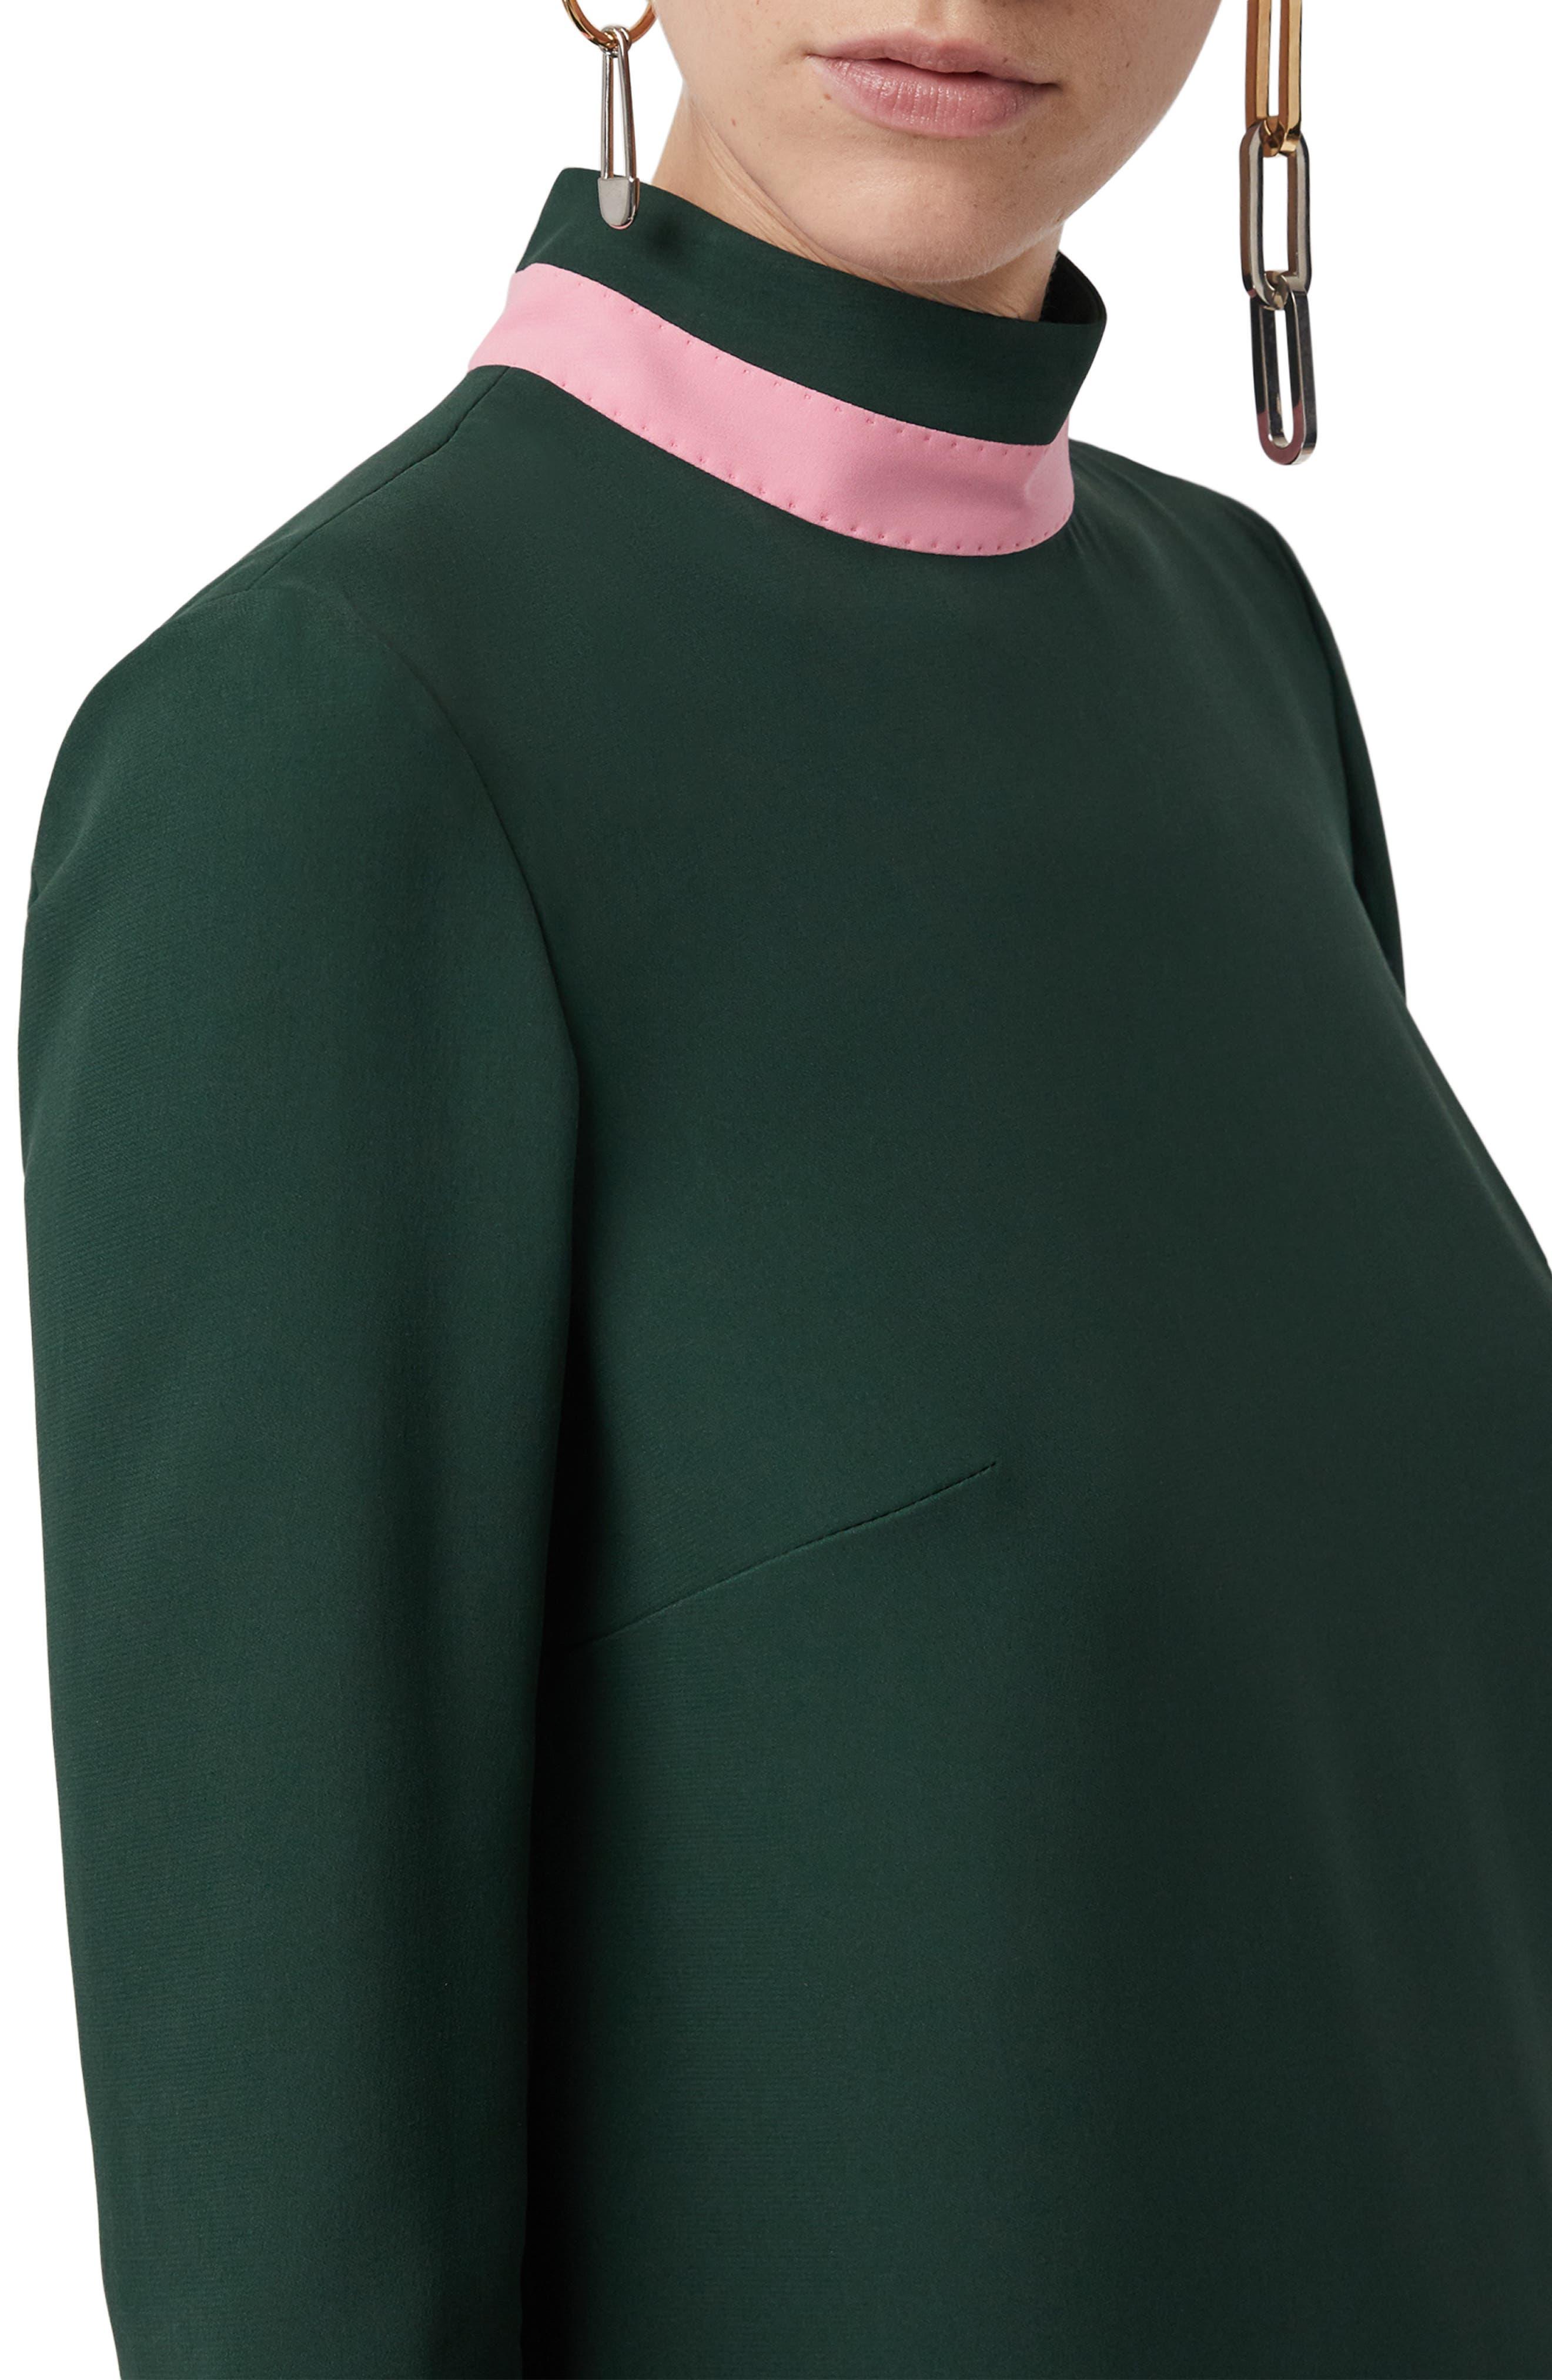 Zoya Two-Tone Shift Dress,                             Alternate thumbnail 4, color,                             301